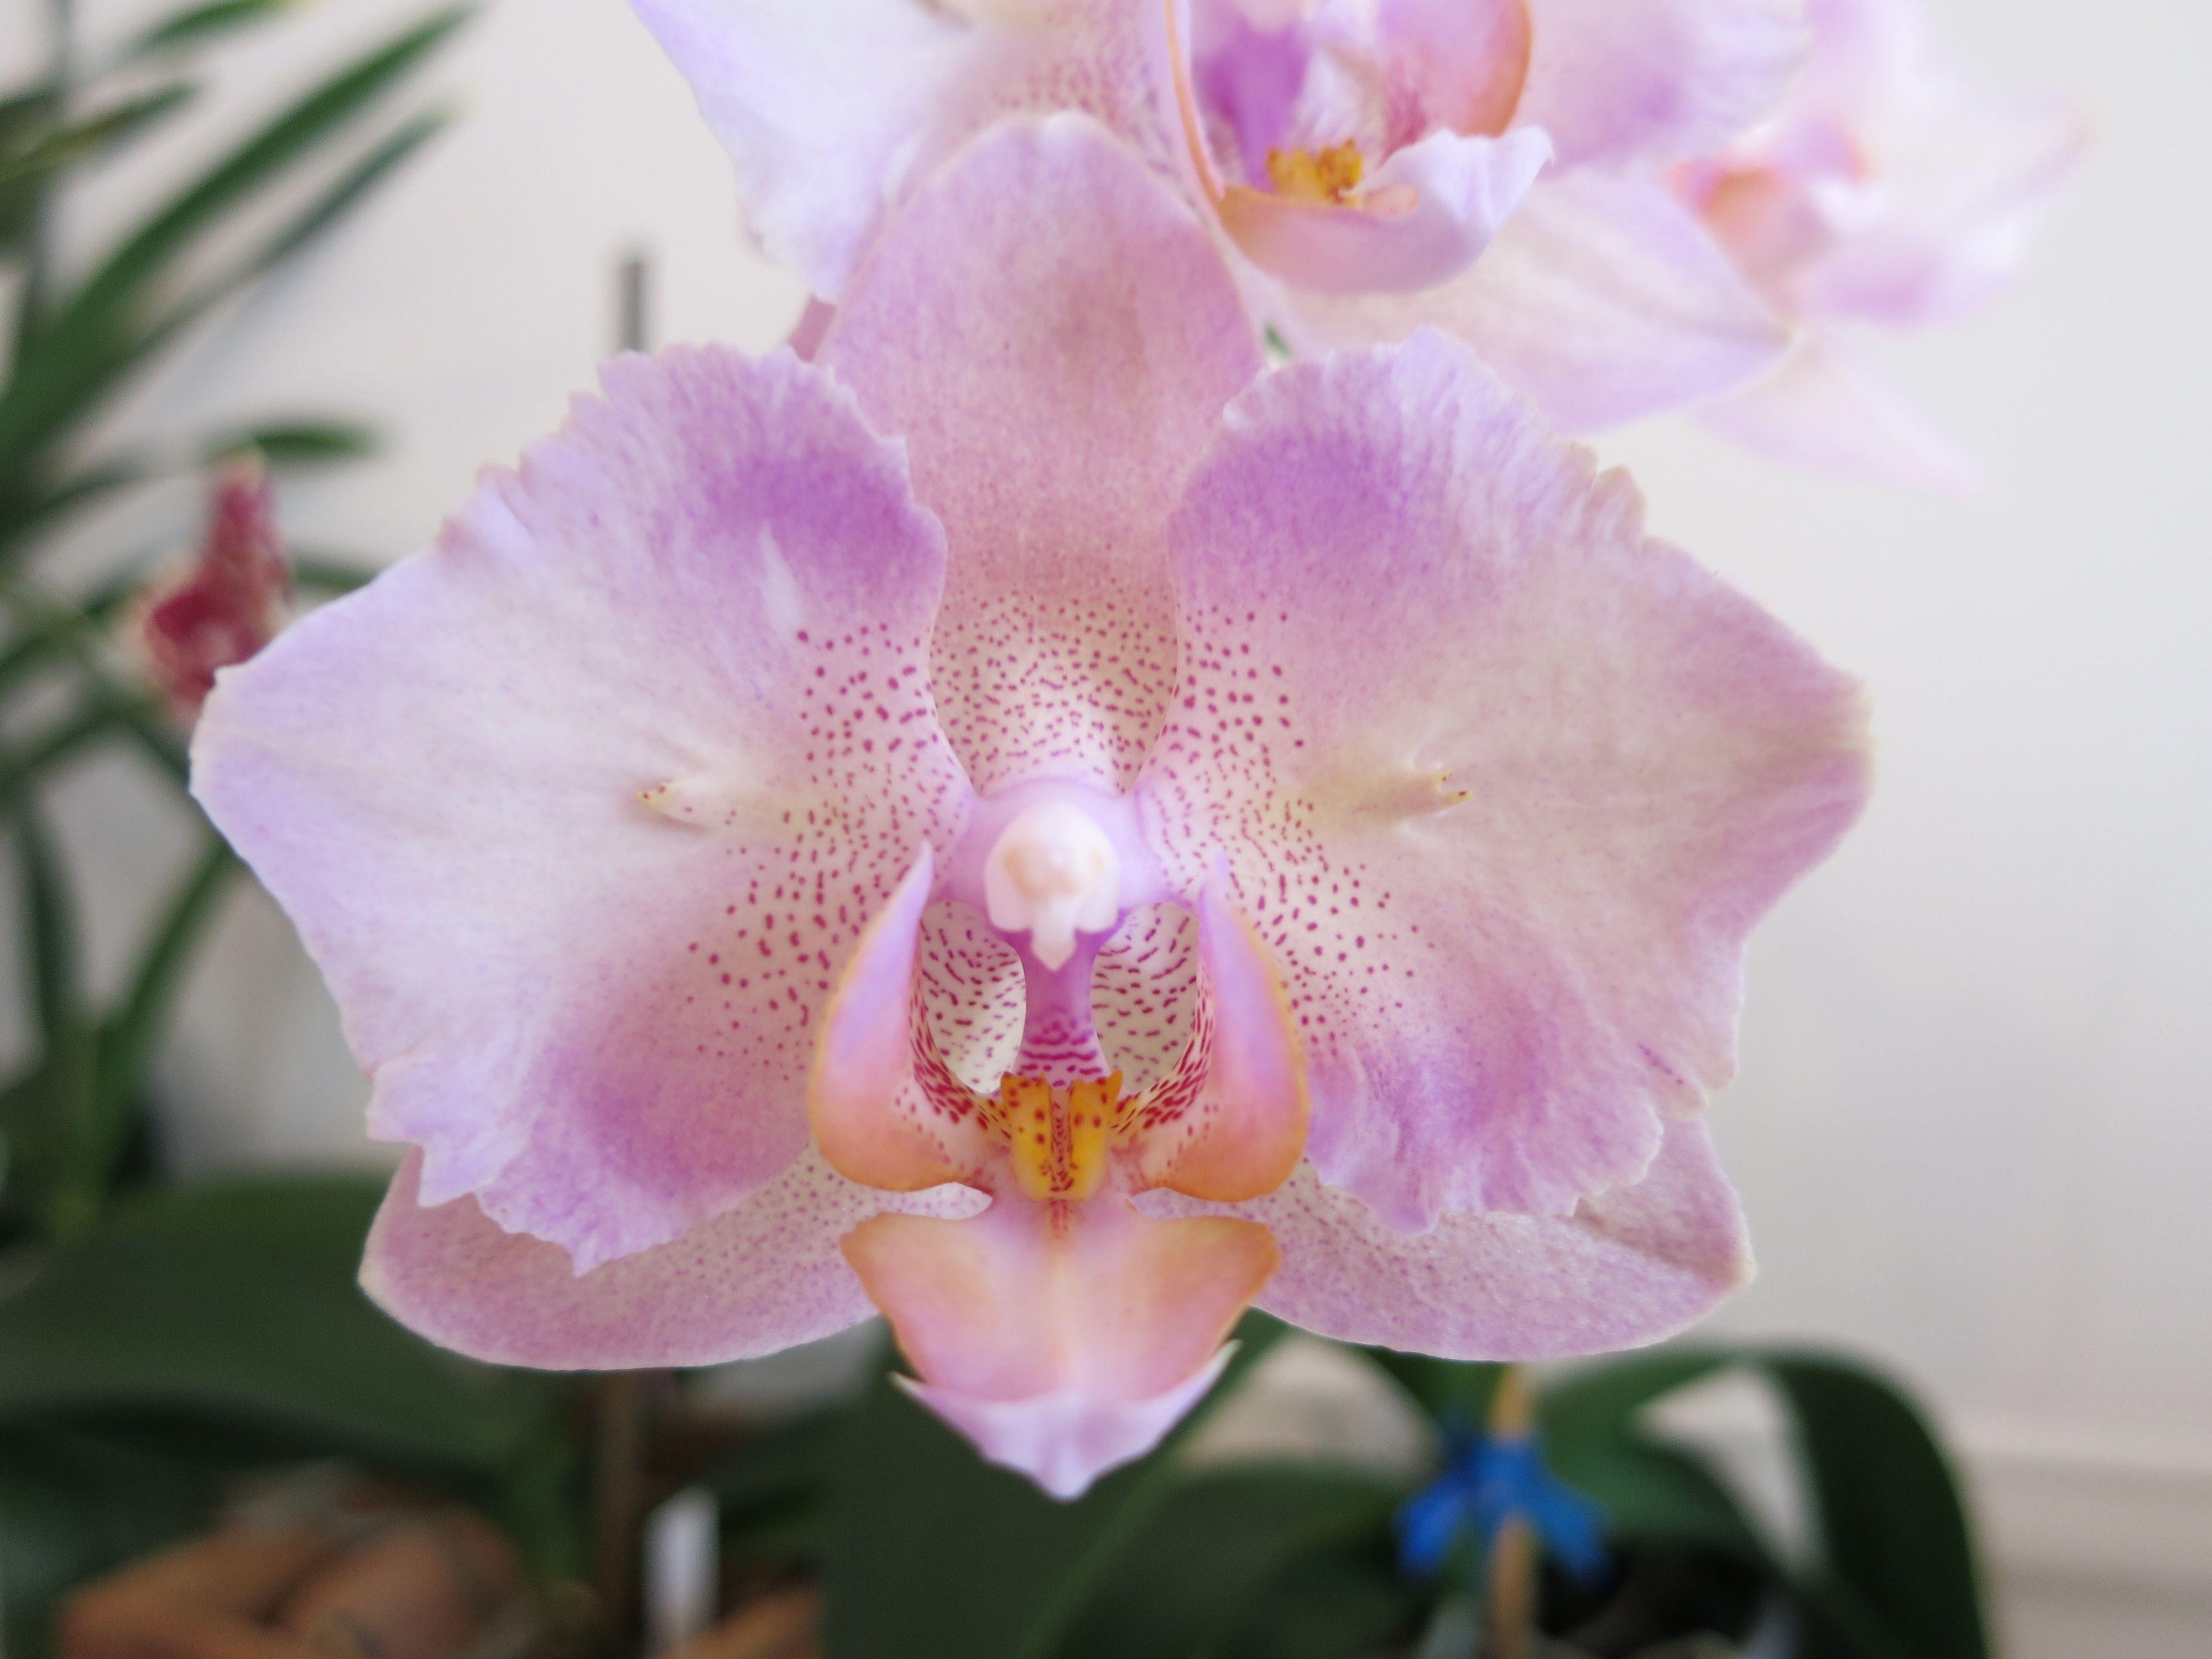 776a7c2003db899d370bd6ecb665c8f1 - How Do I Get My Phalaenopsis Orchid To Rebloom